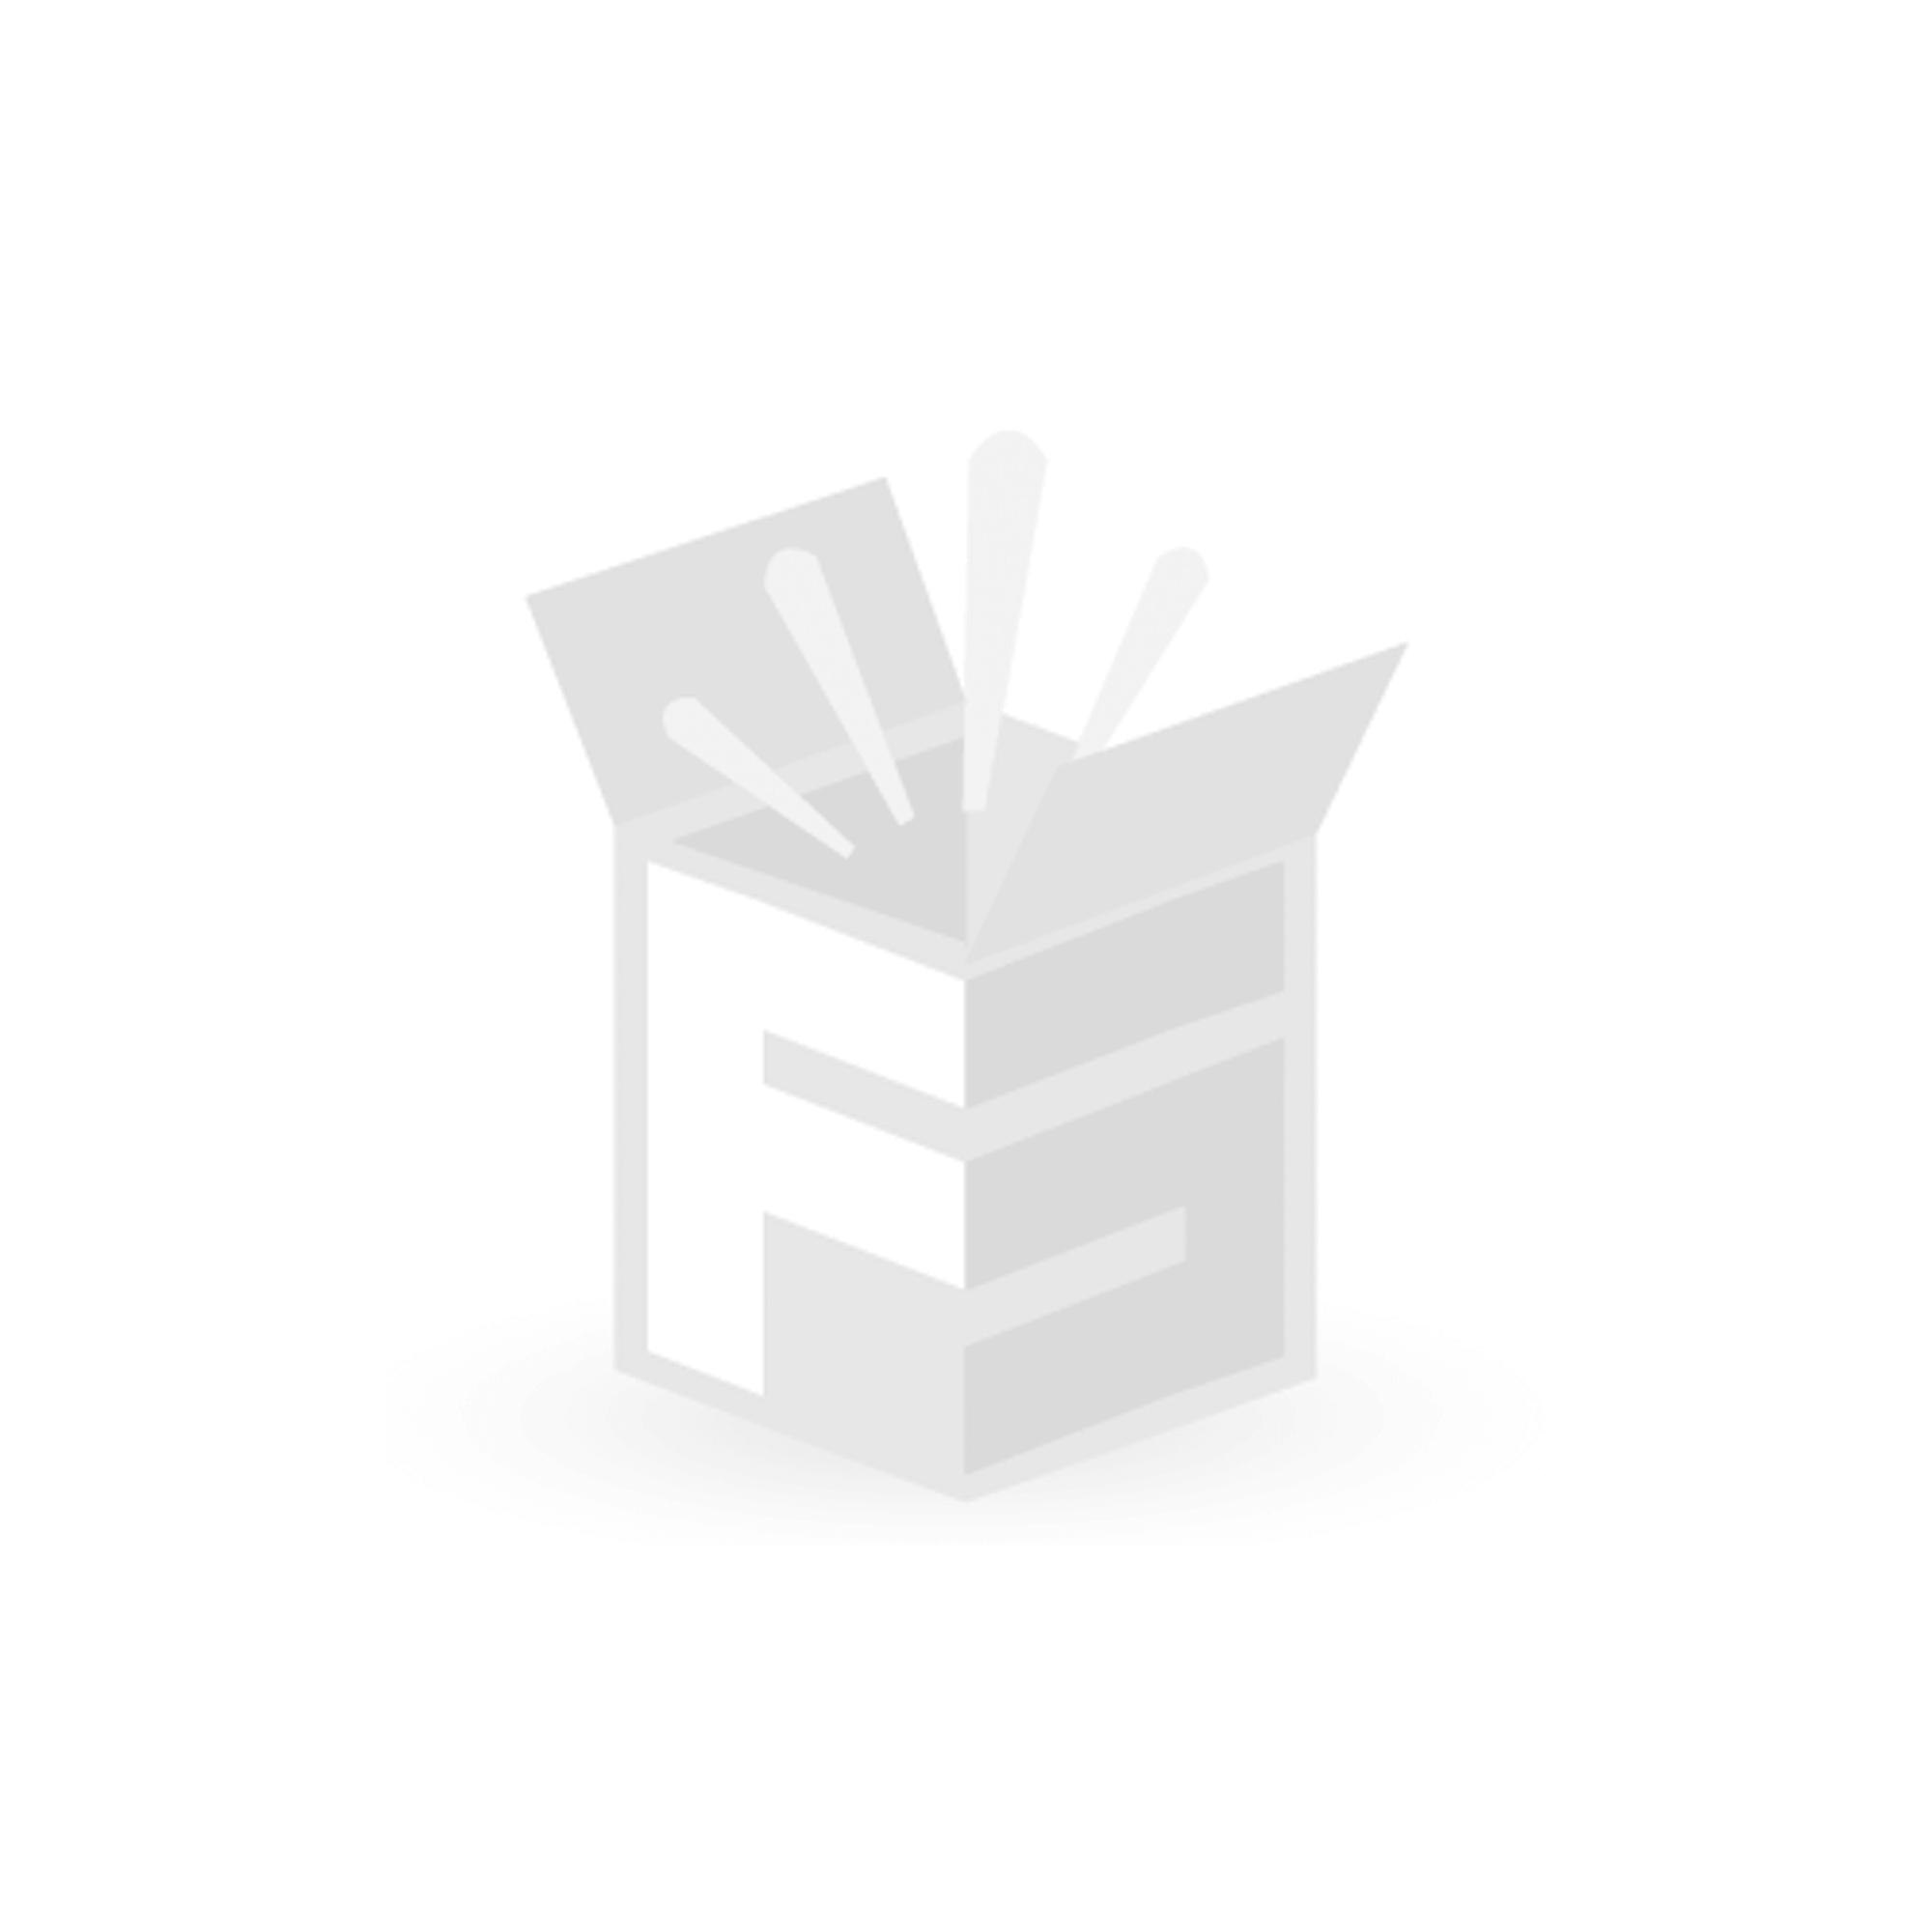 Kibernetik Bain Marie 2x 9.5 Liter, Gastronorm